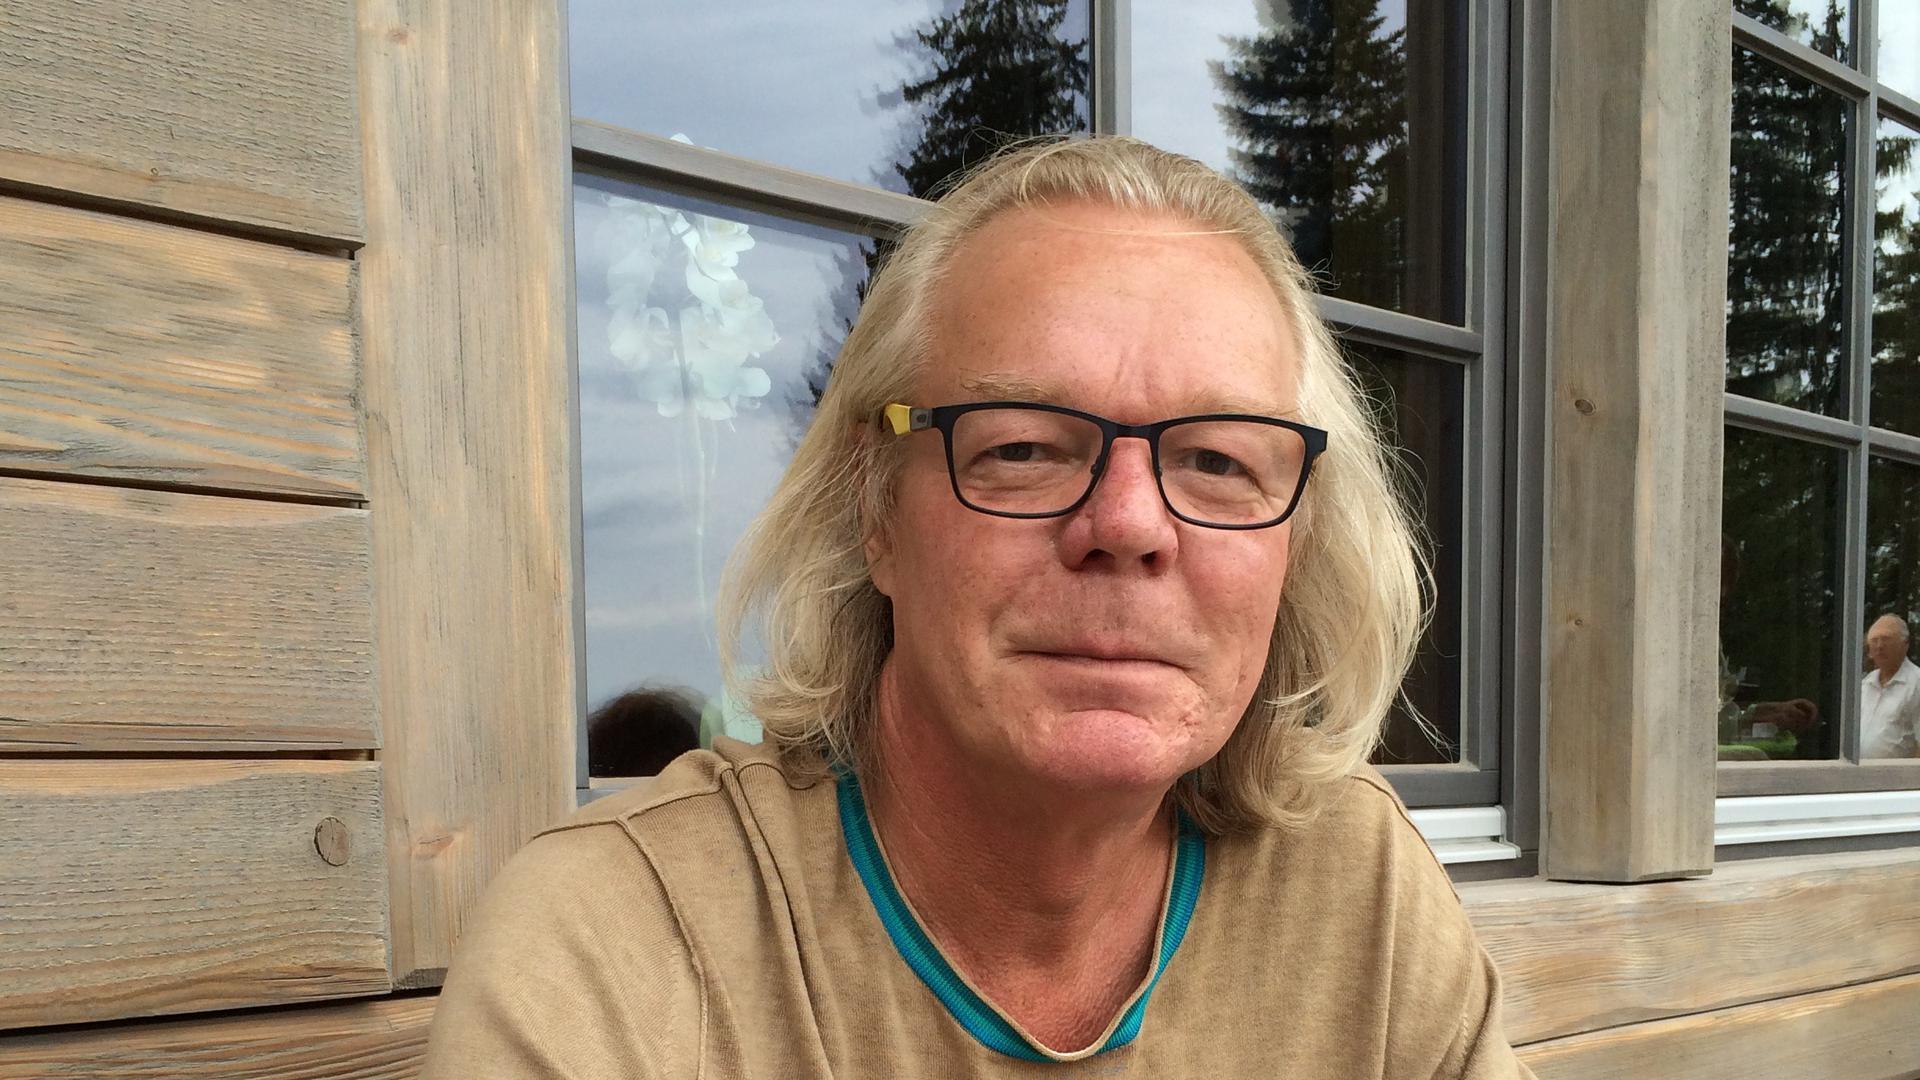 Ralf Kaminsky, Gruppenkoordinator von Greenpeace Pforzheim.